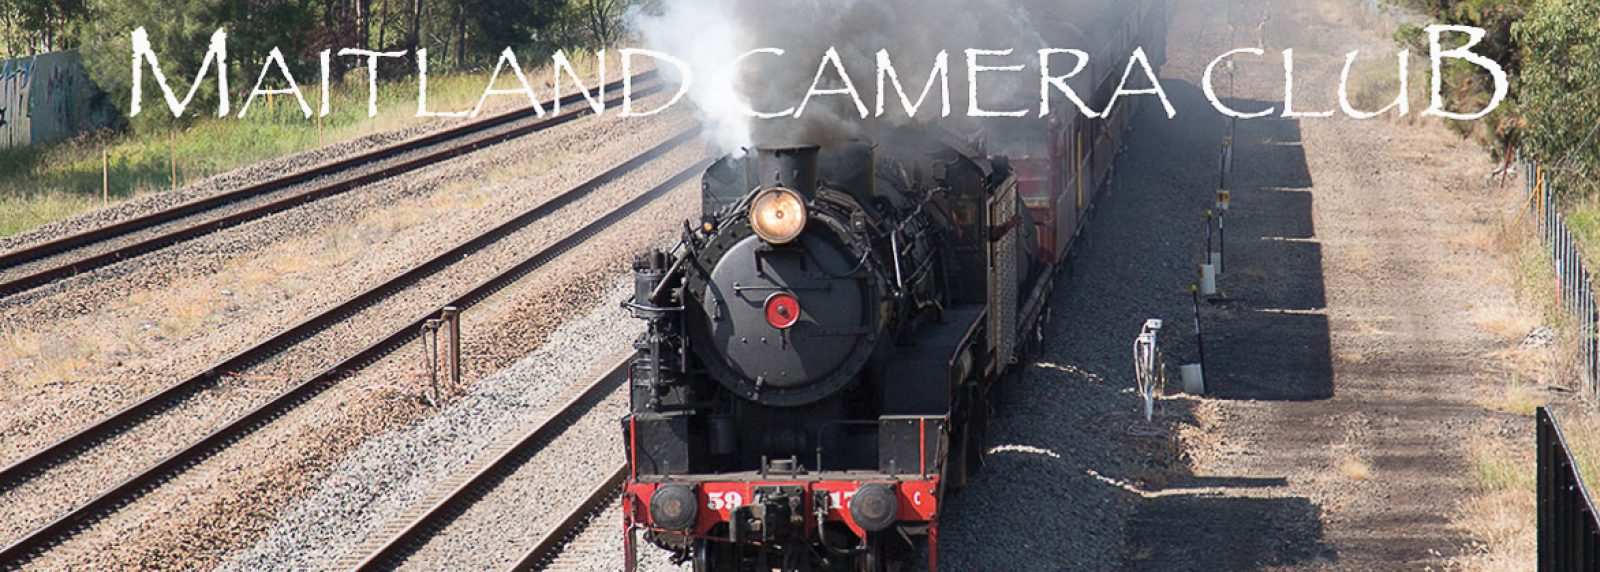 Maitland Camera Club